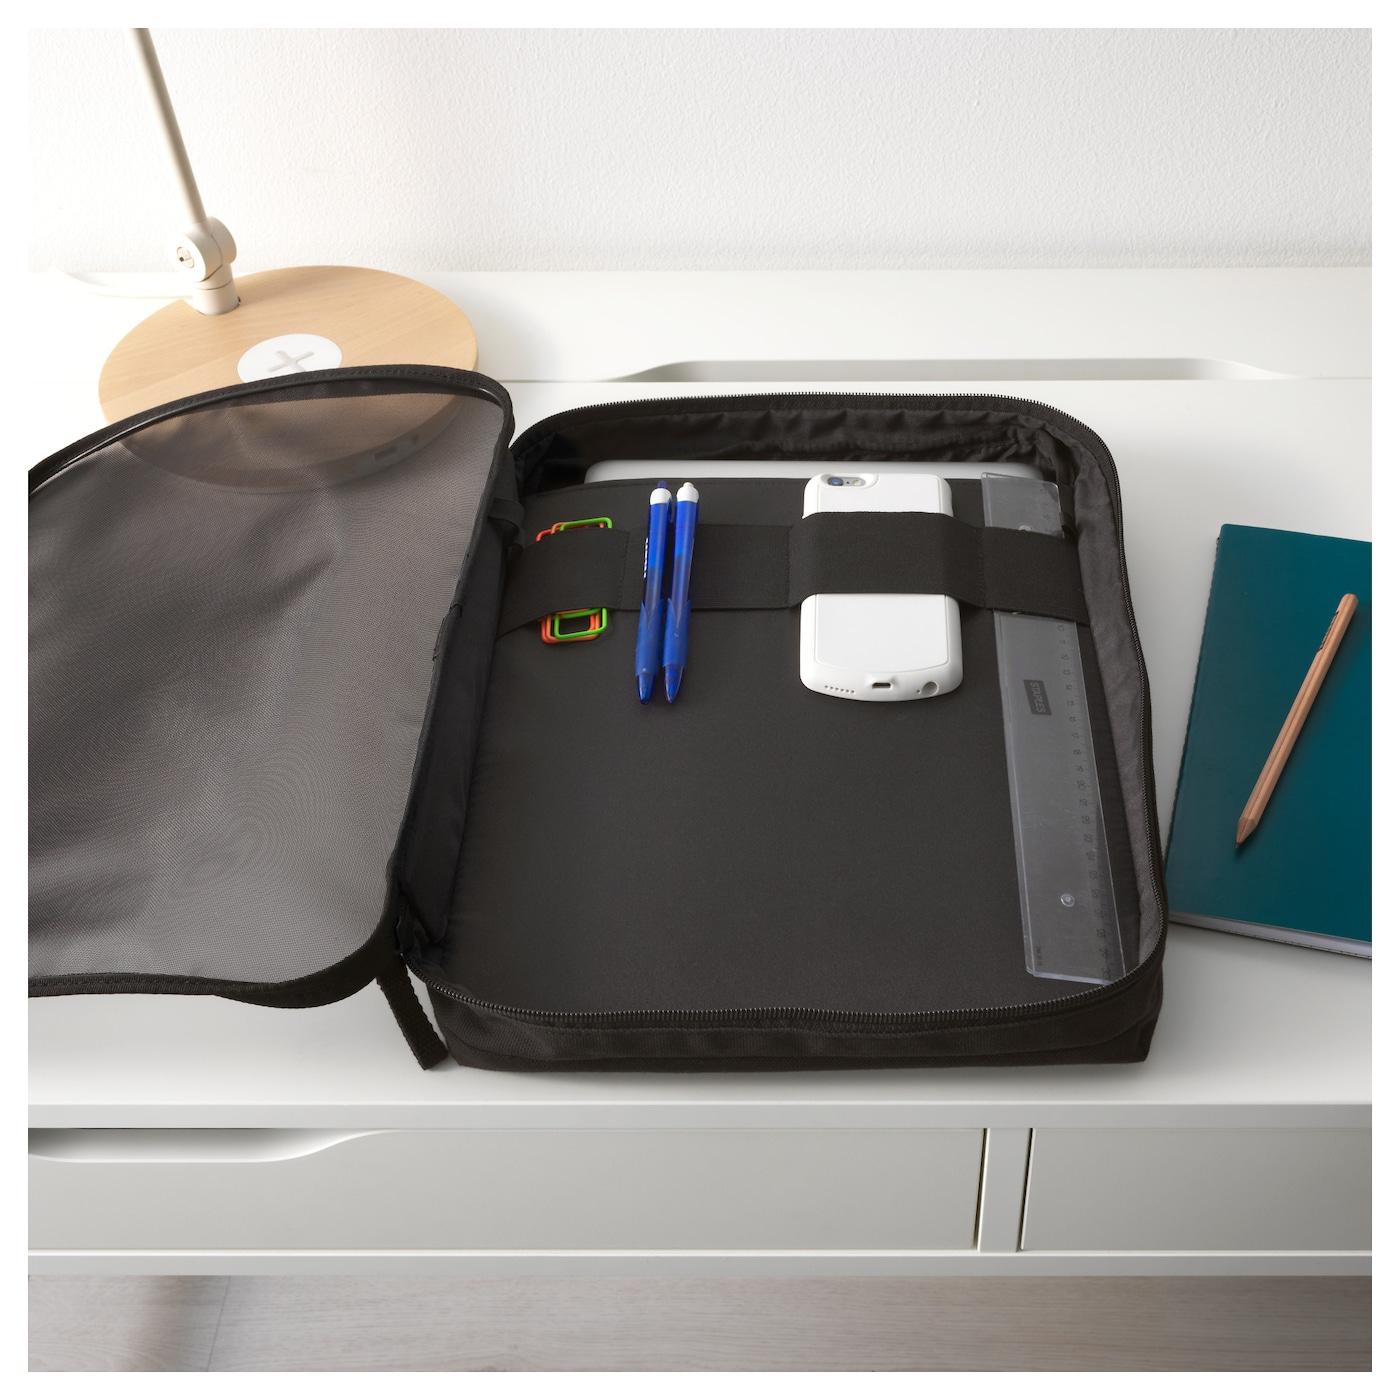 F rfina sacoche pour portable noir ikea for Panier d ordinateur portable ikea